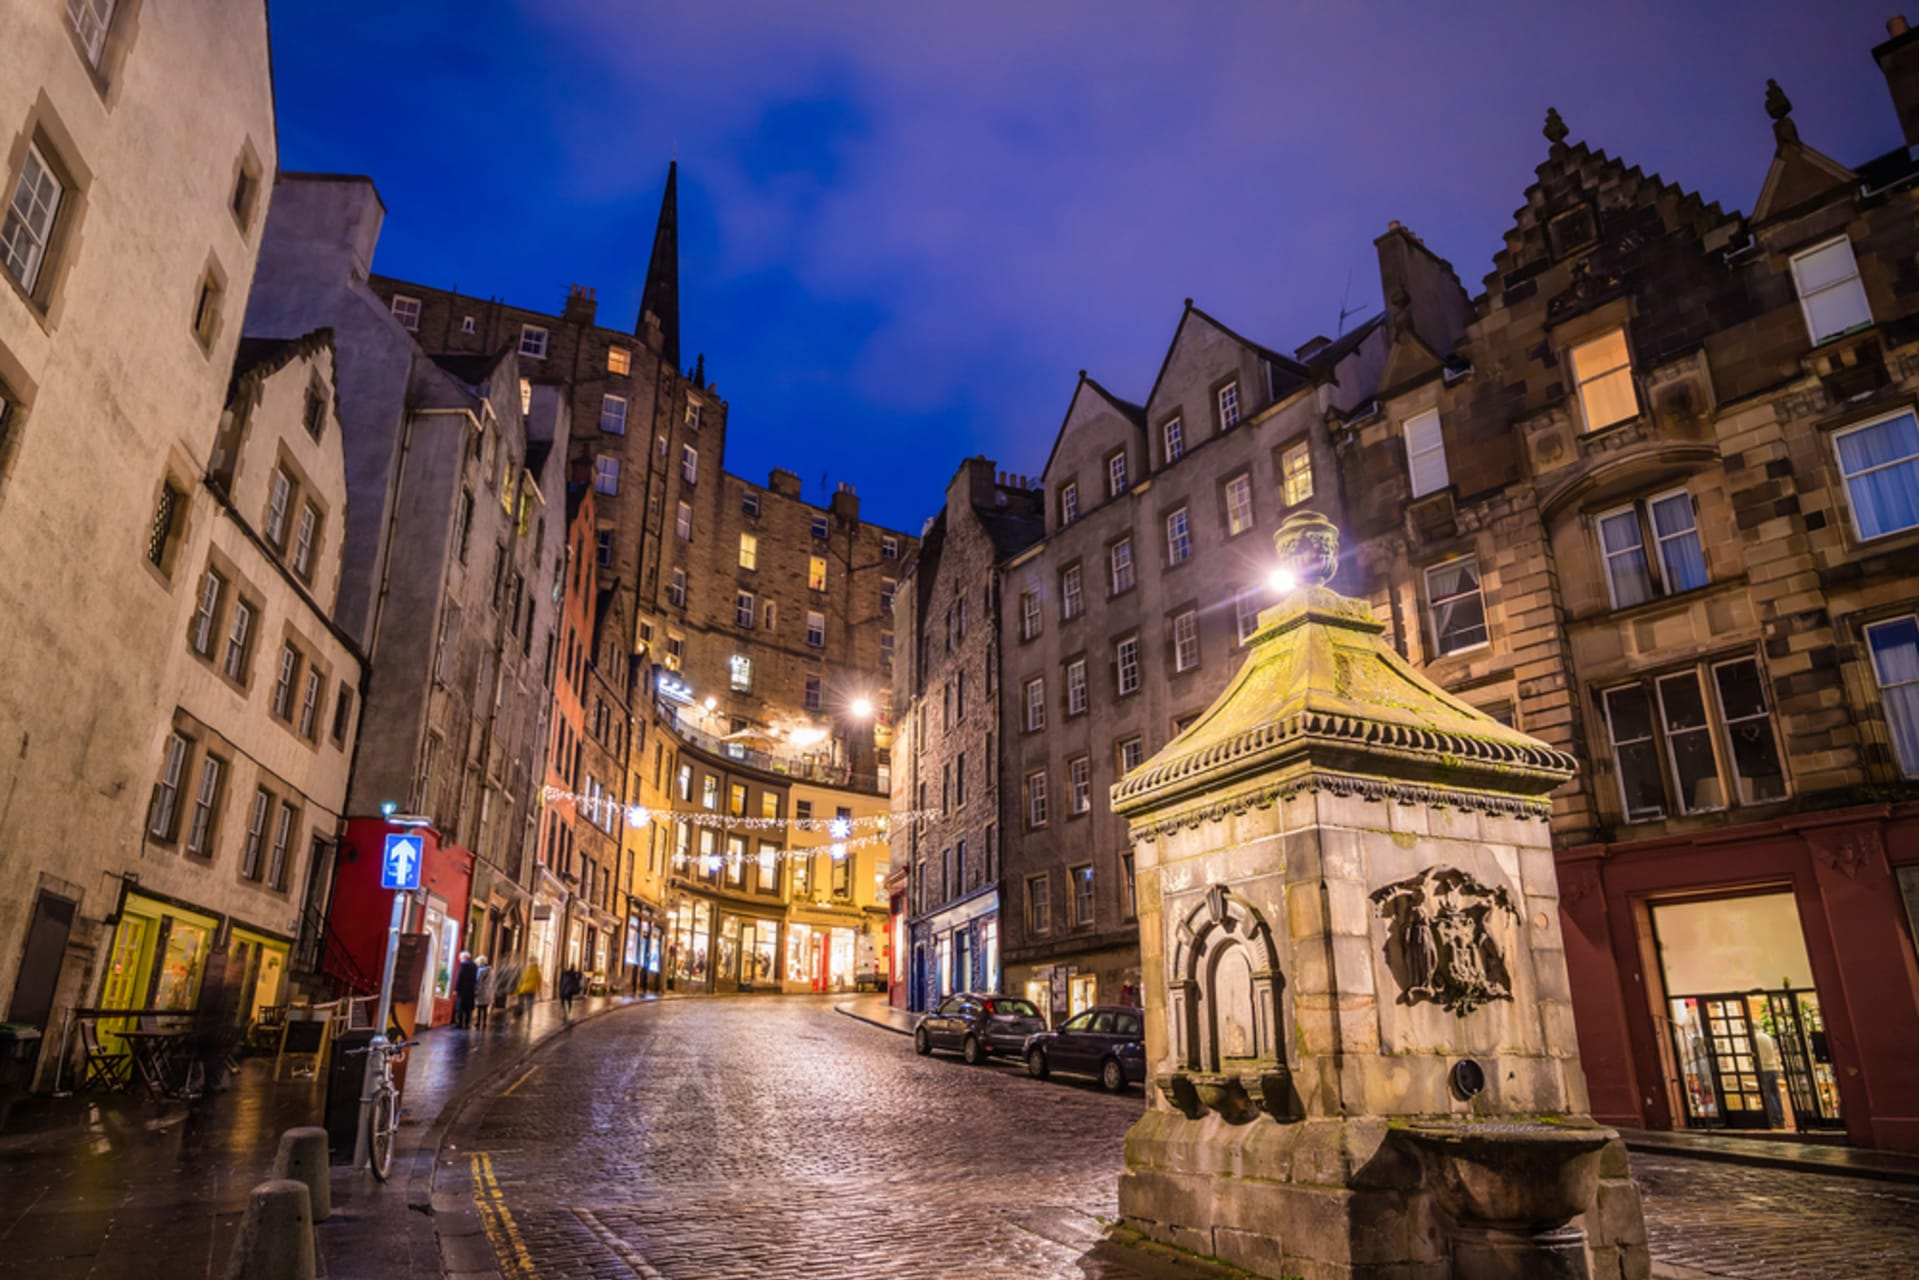 Edinburgh - Edinburgh's Old Town by night - a Postcard Tour